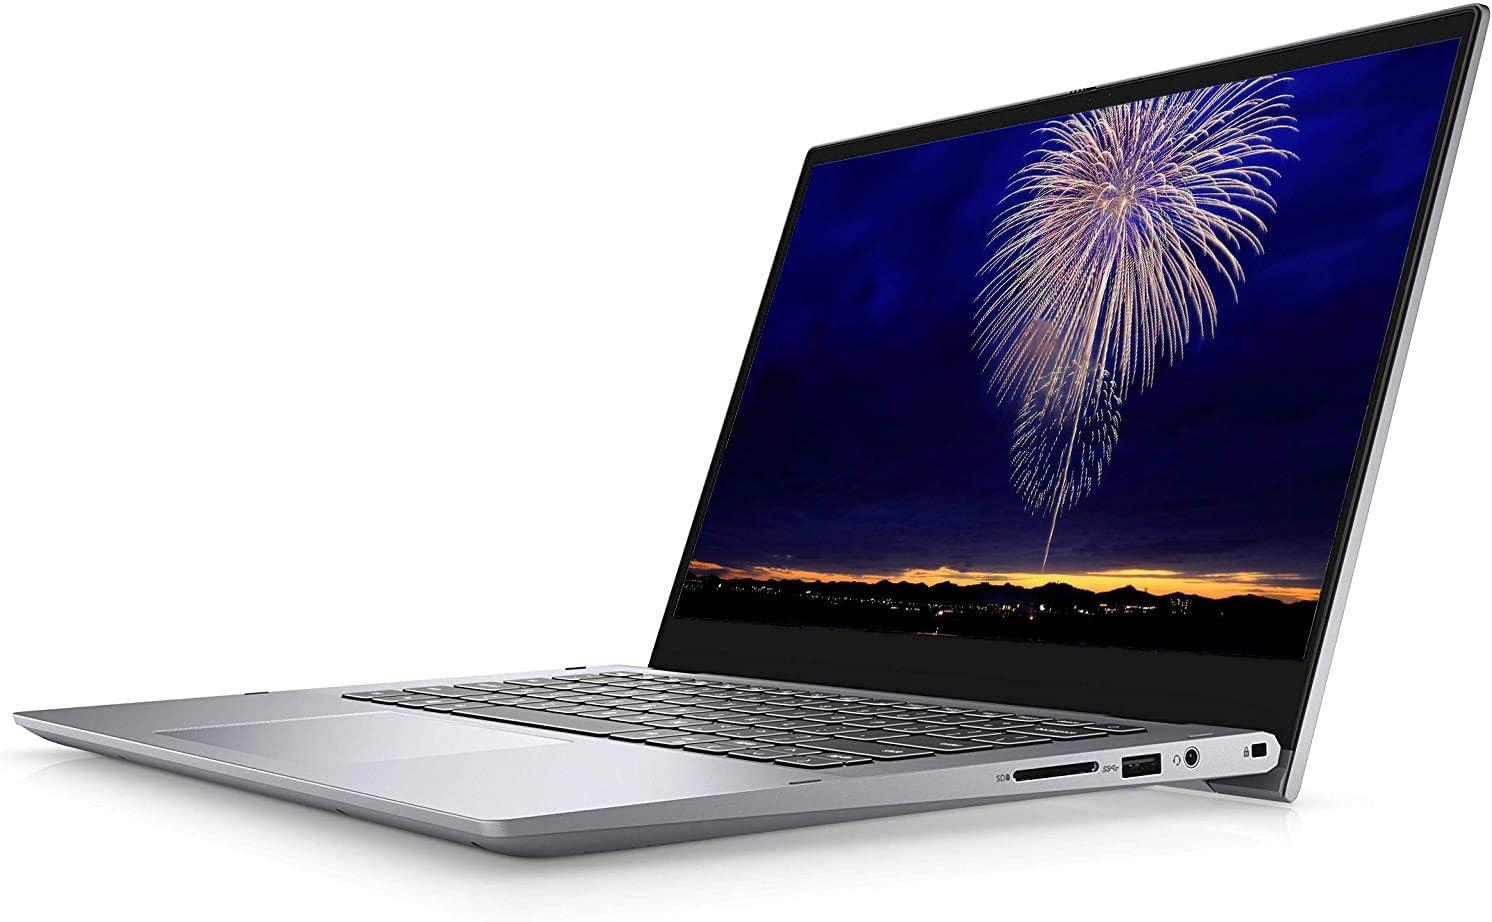 "2021 Dell Inspiron 14 5000 2-in-1 Business Laptop Computer, 14"" FHD Touchscreen, 11th Gen Intel 4-Core i7-1165G7, 32GB DDR4 RAM, 1TB NVMe SSD,Webcam,USB-C,HDMI | Windows 10 Pro"